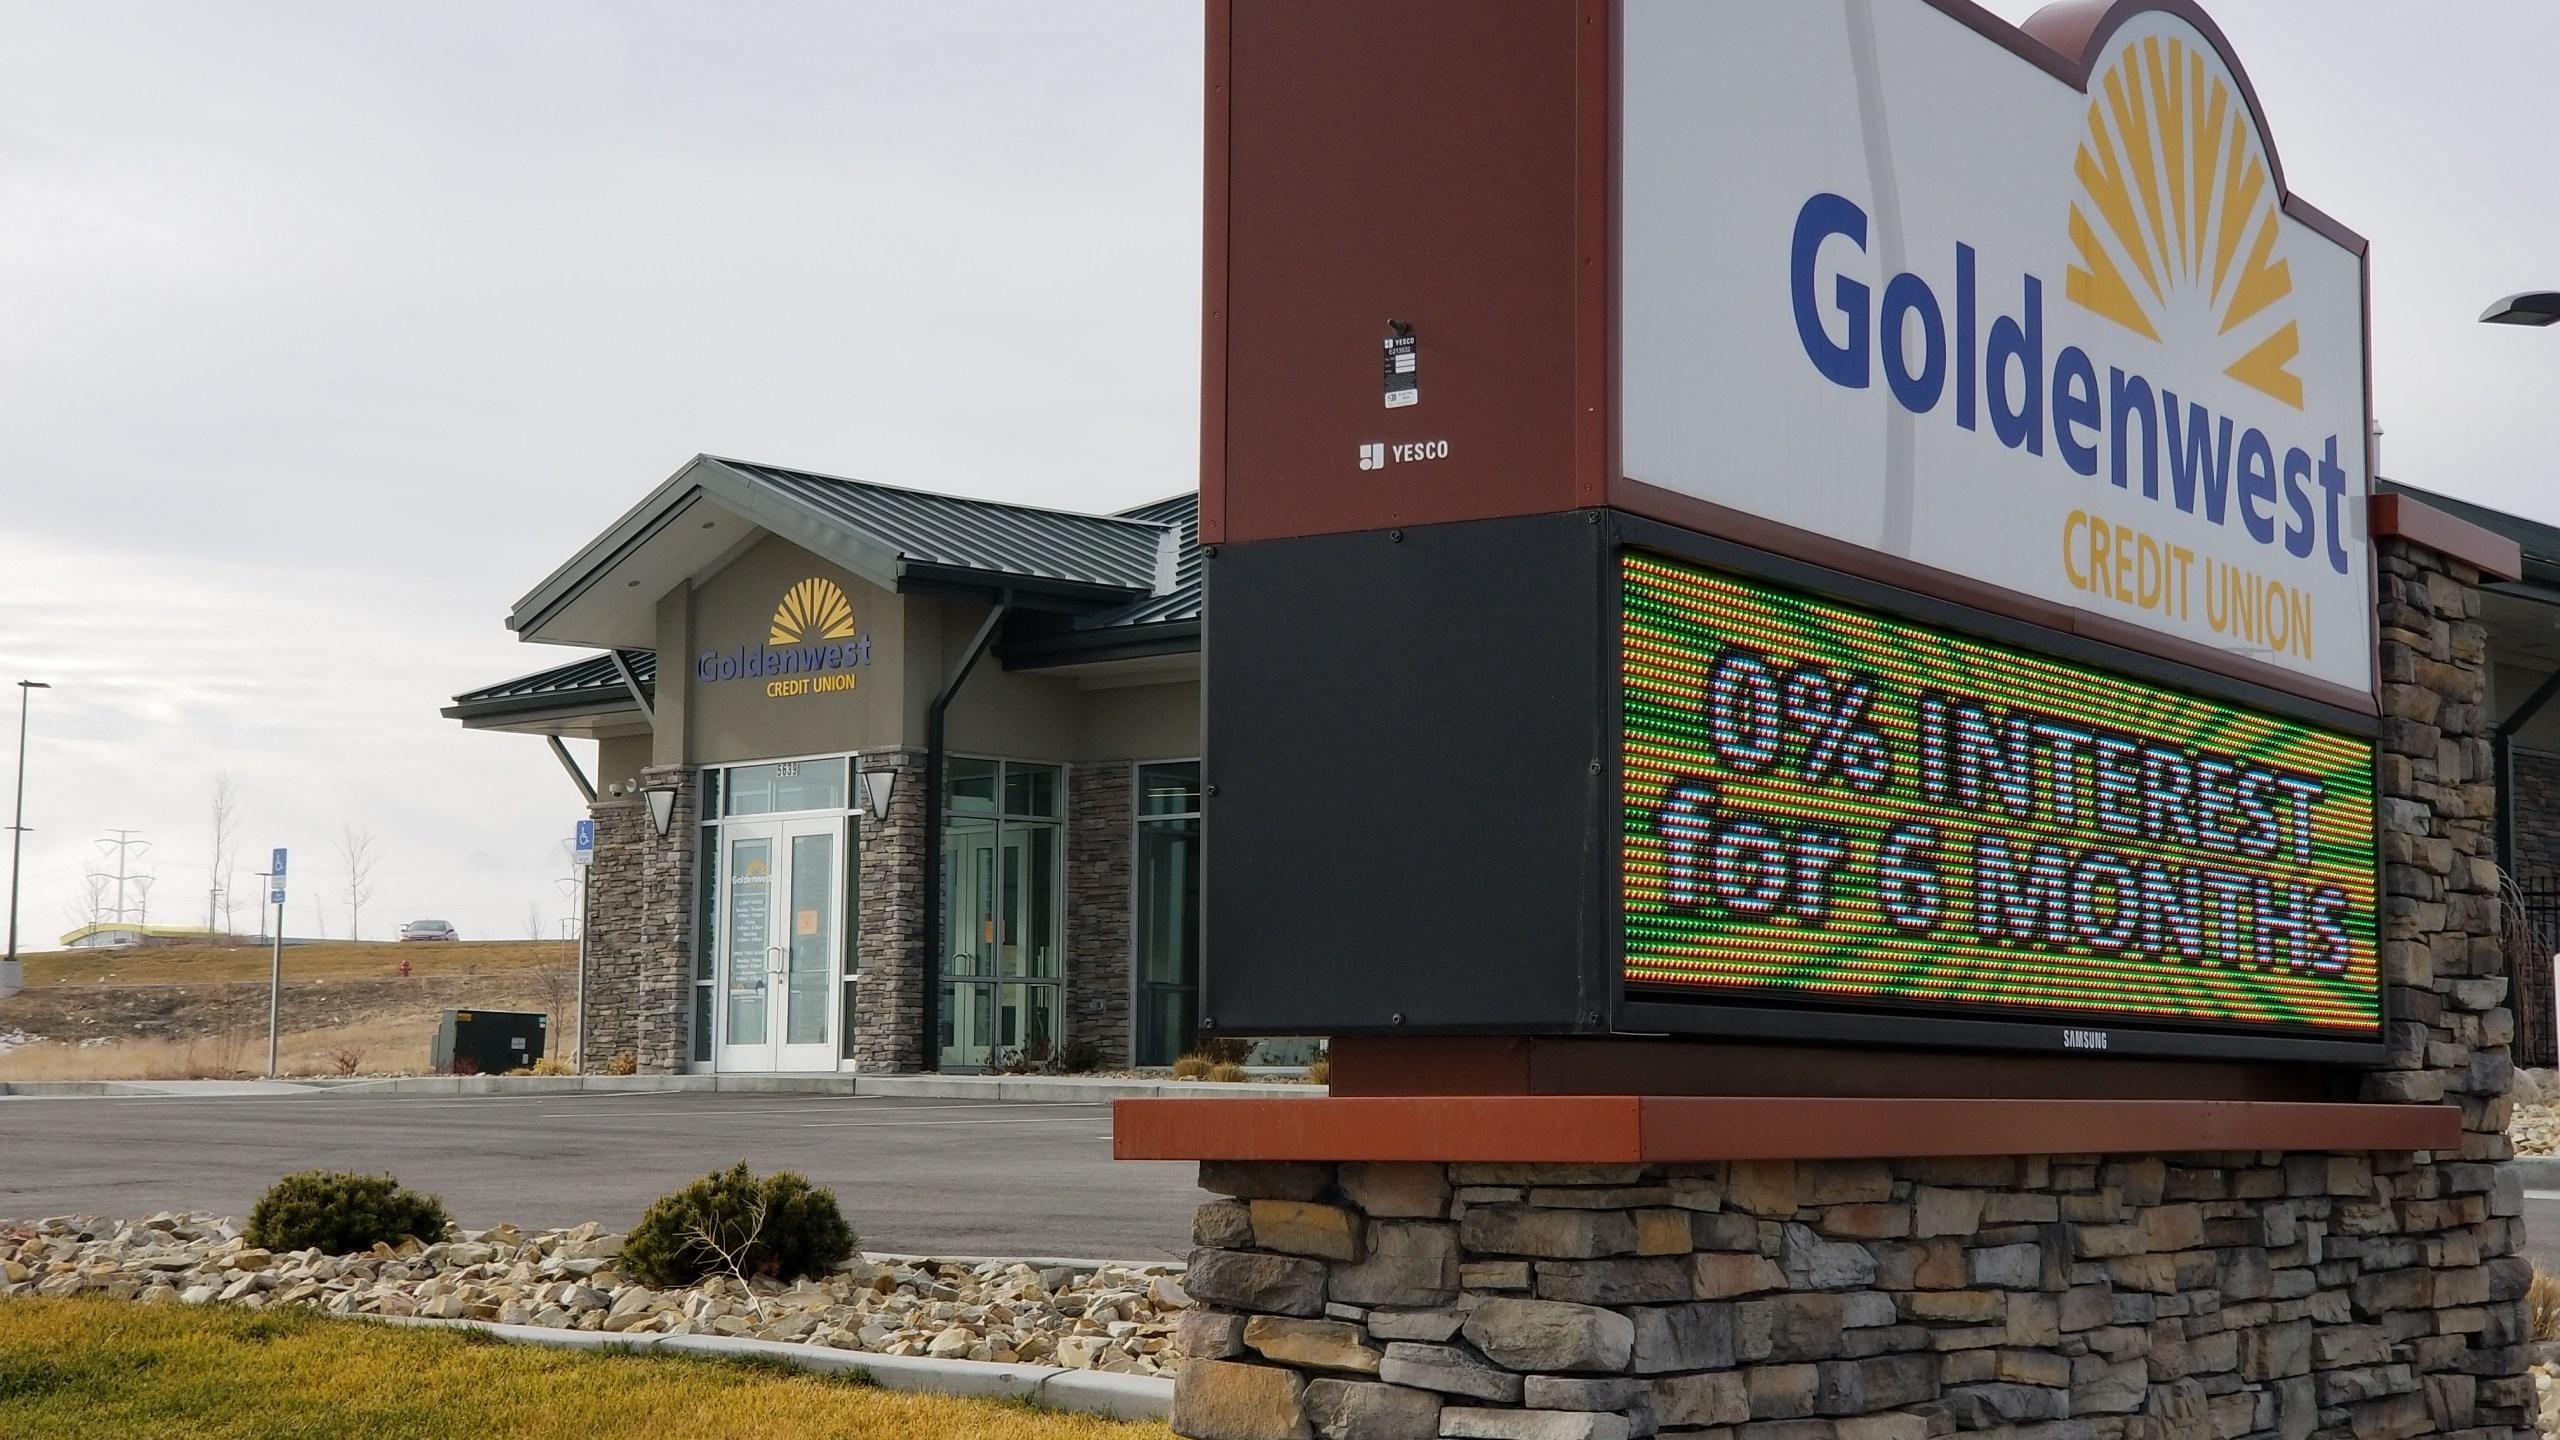 goldenwest credit union